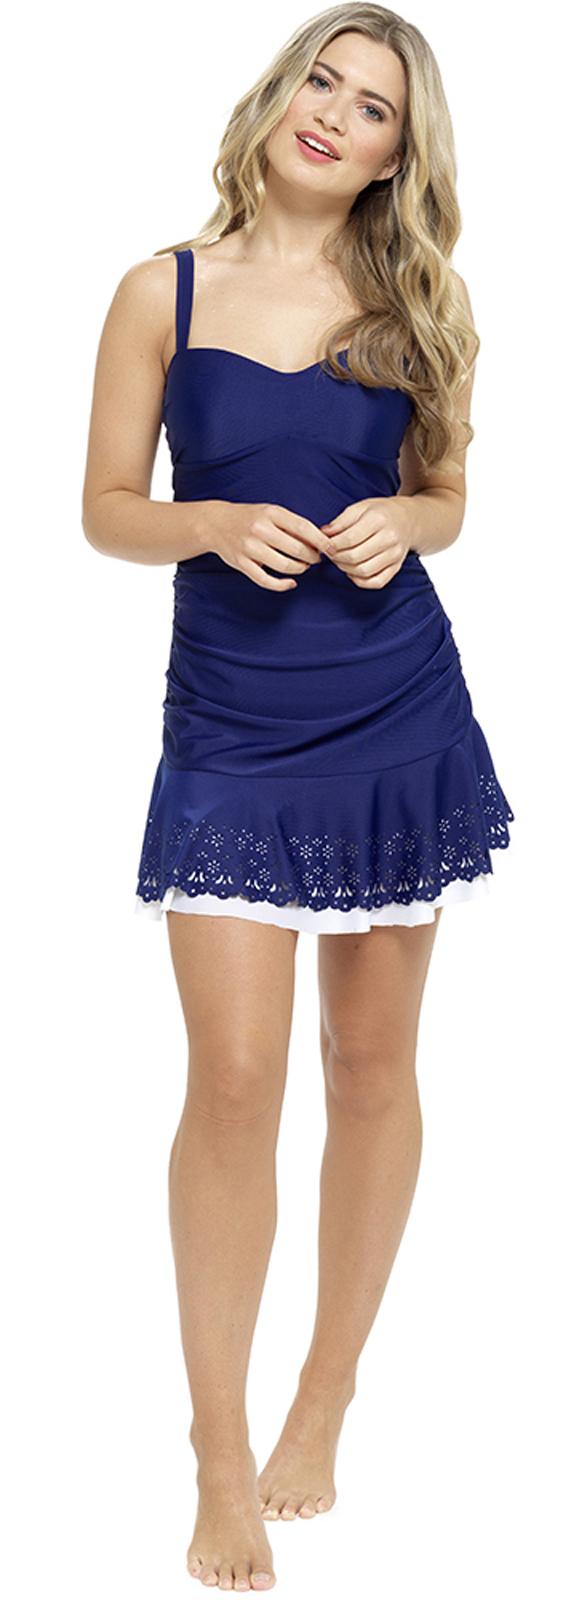 womens swimdress swimming costume with skirt tummy support